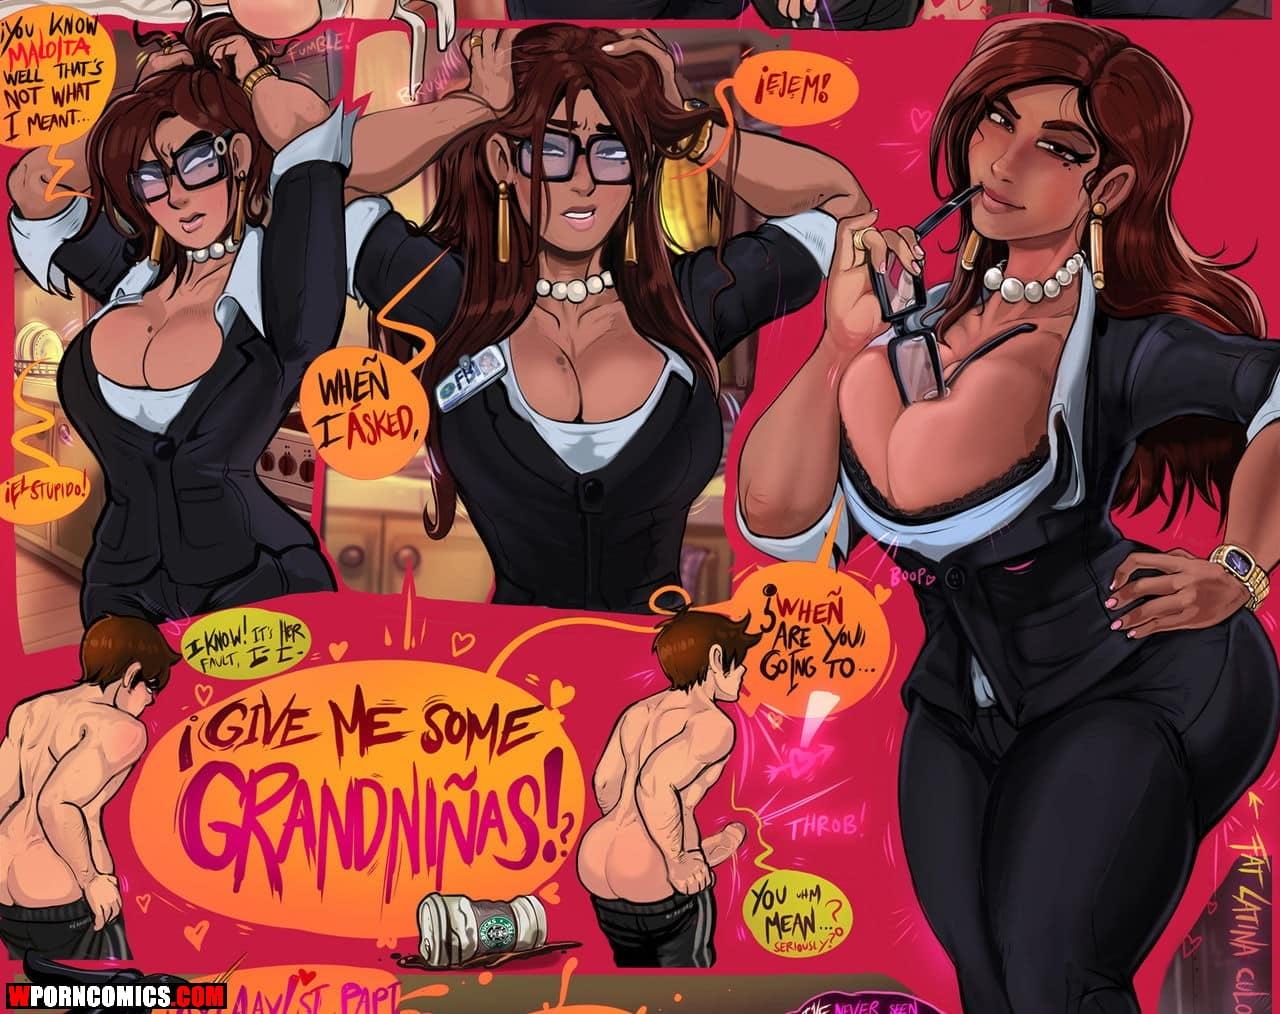 porn-comic-step-siblings-2020-03-07/porn-comic-step-siblings-2020-03-07-47965.jpg